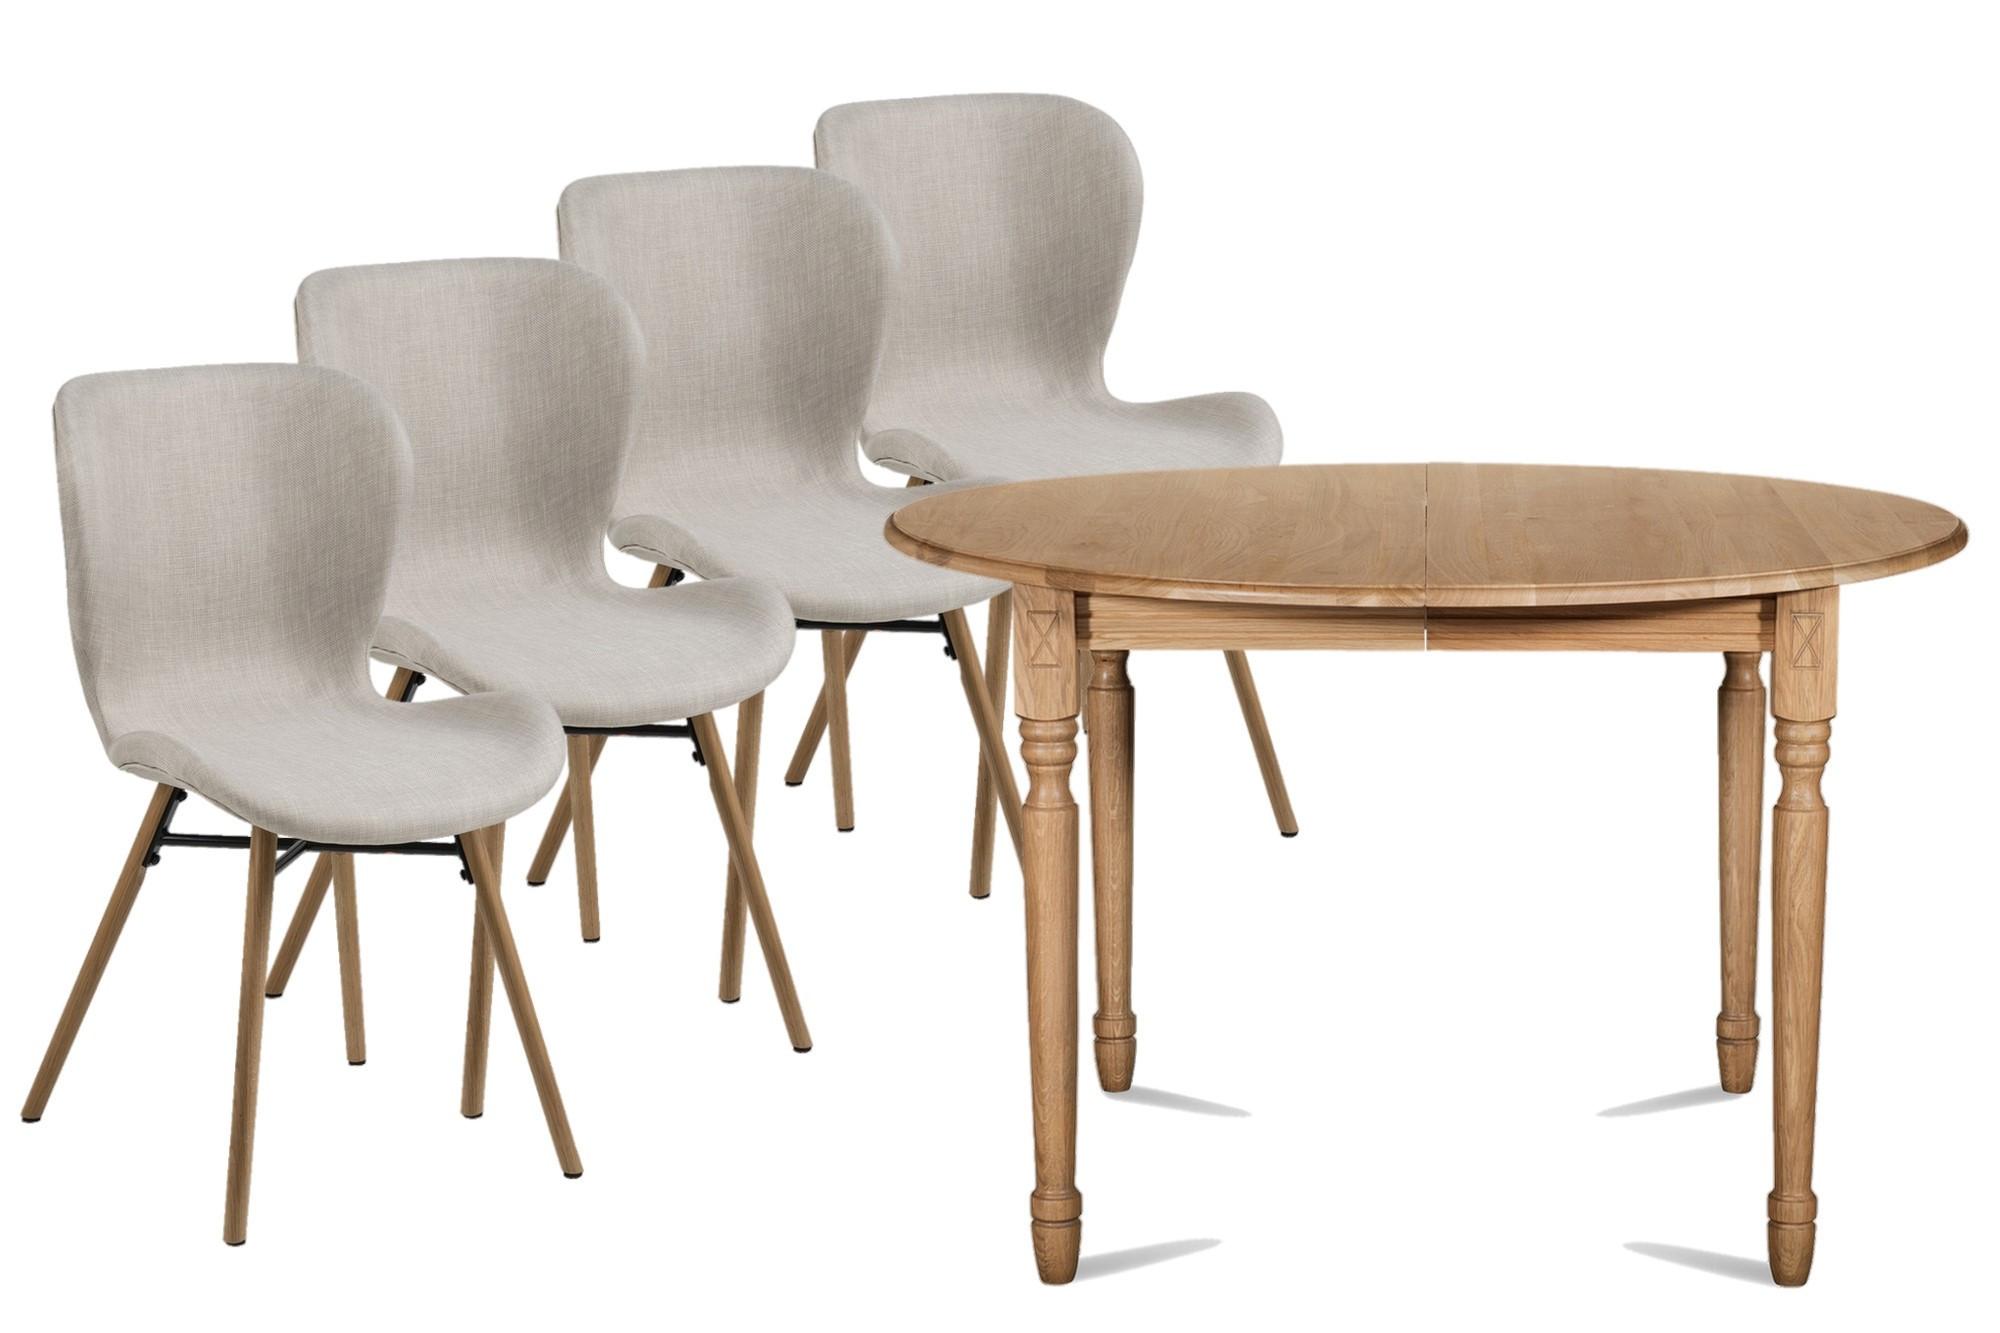 Table Ronde Et Chaises.Ensemble Table Ronde Chaises Matilda Hellin